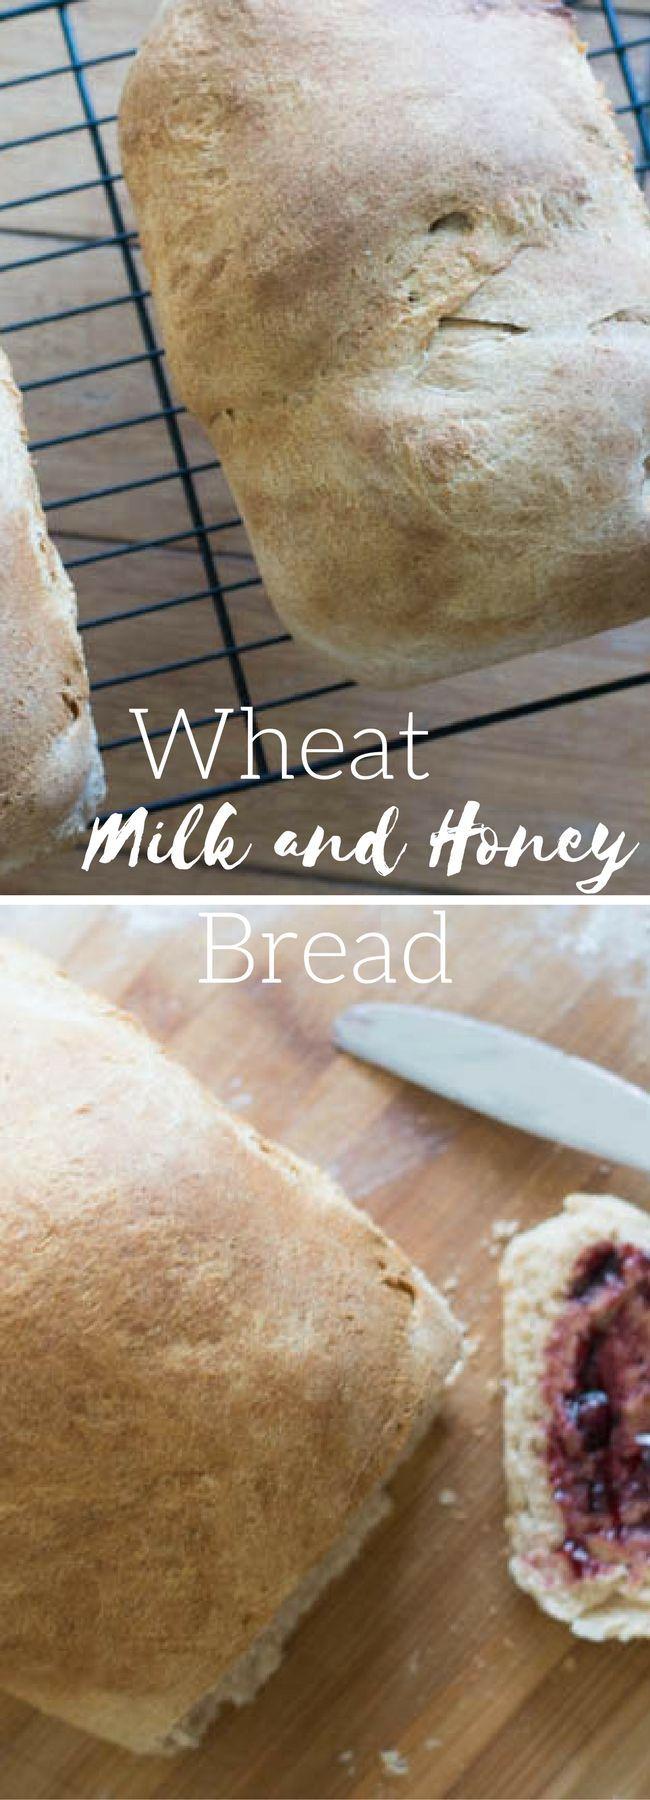 Wheat Bread / Homemade Wheat Bread / Milk and Honey Bread / Wheat Milk and Honey Bread / Homemade Bread / Bread Making